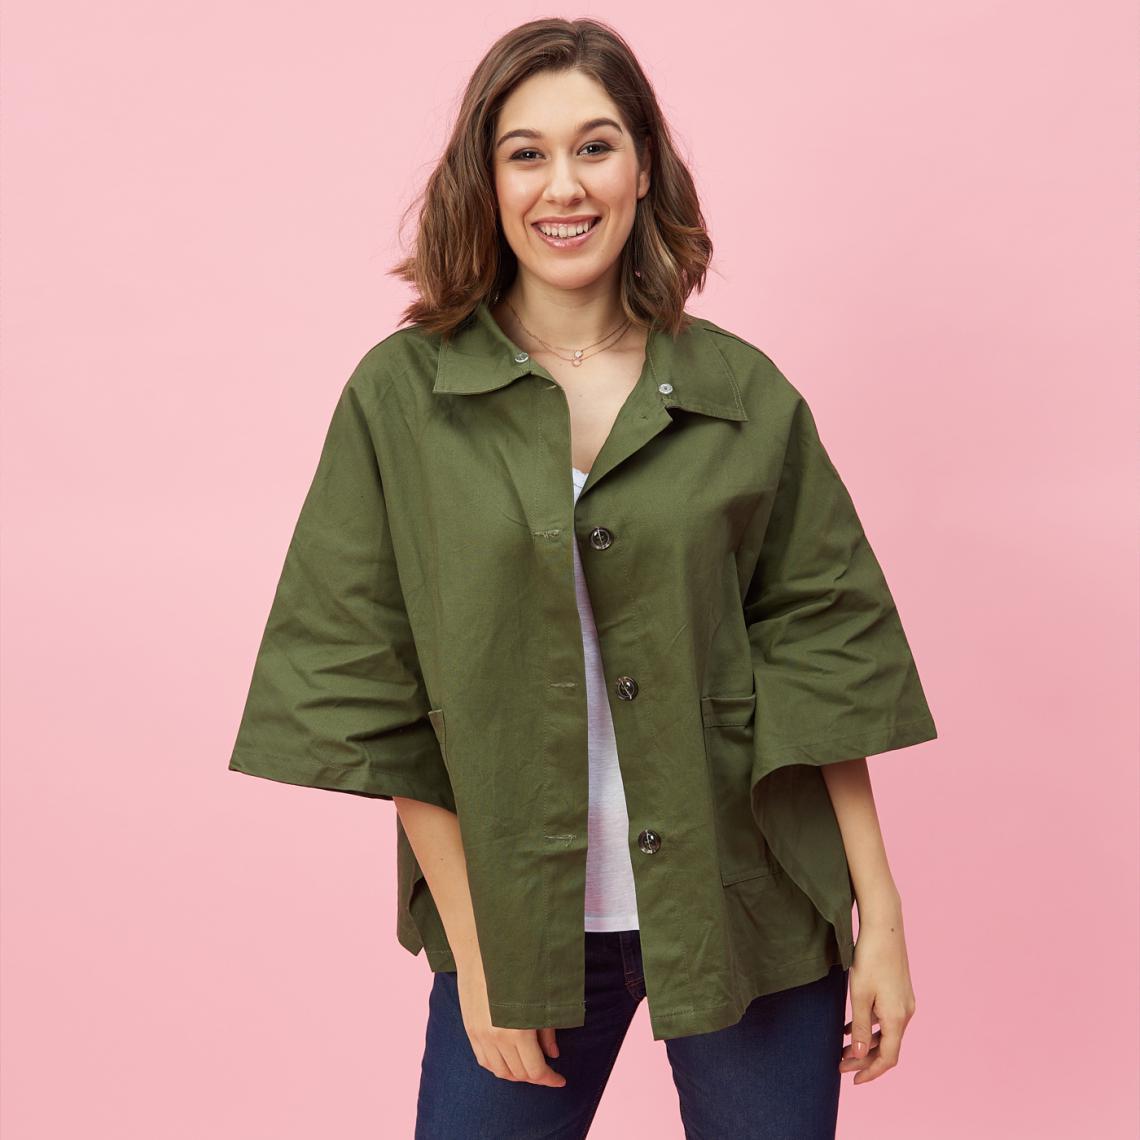 taille 40 0b0e4 cd064 Parka poncho col chemise et boutons femme - Vert | 3 SUISSES